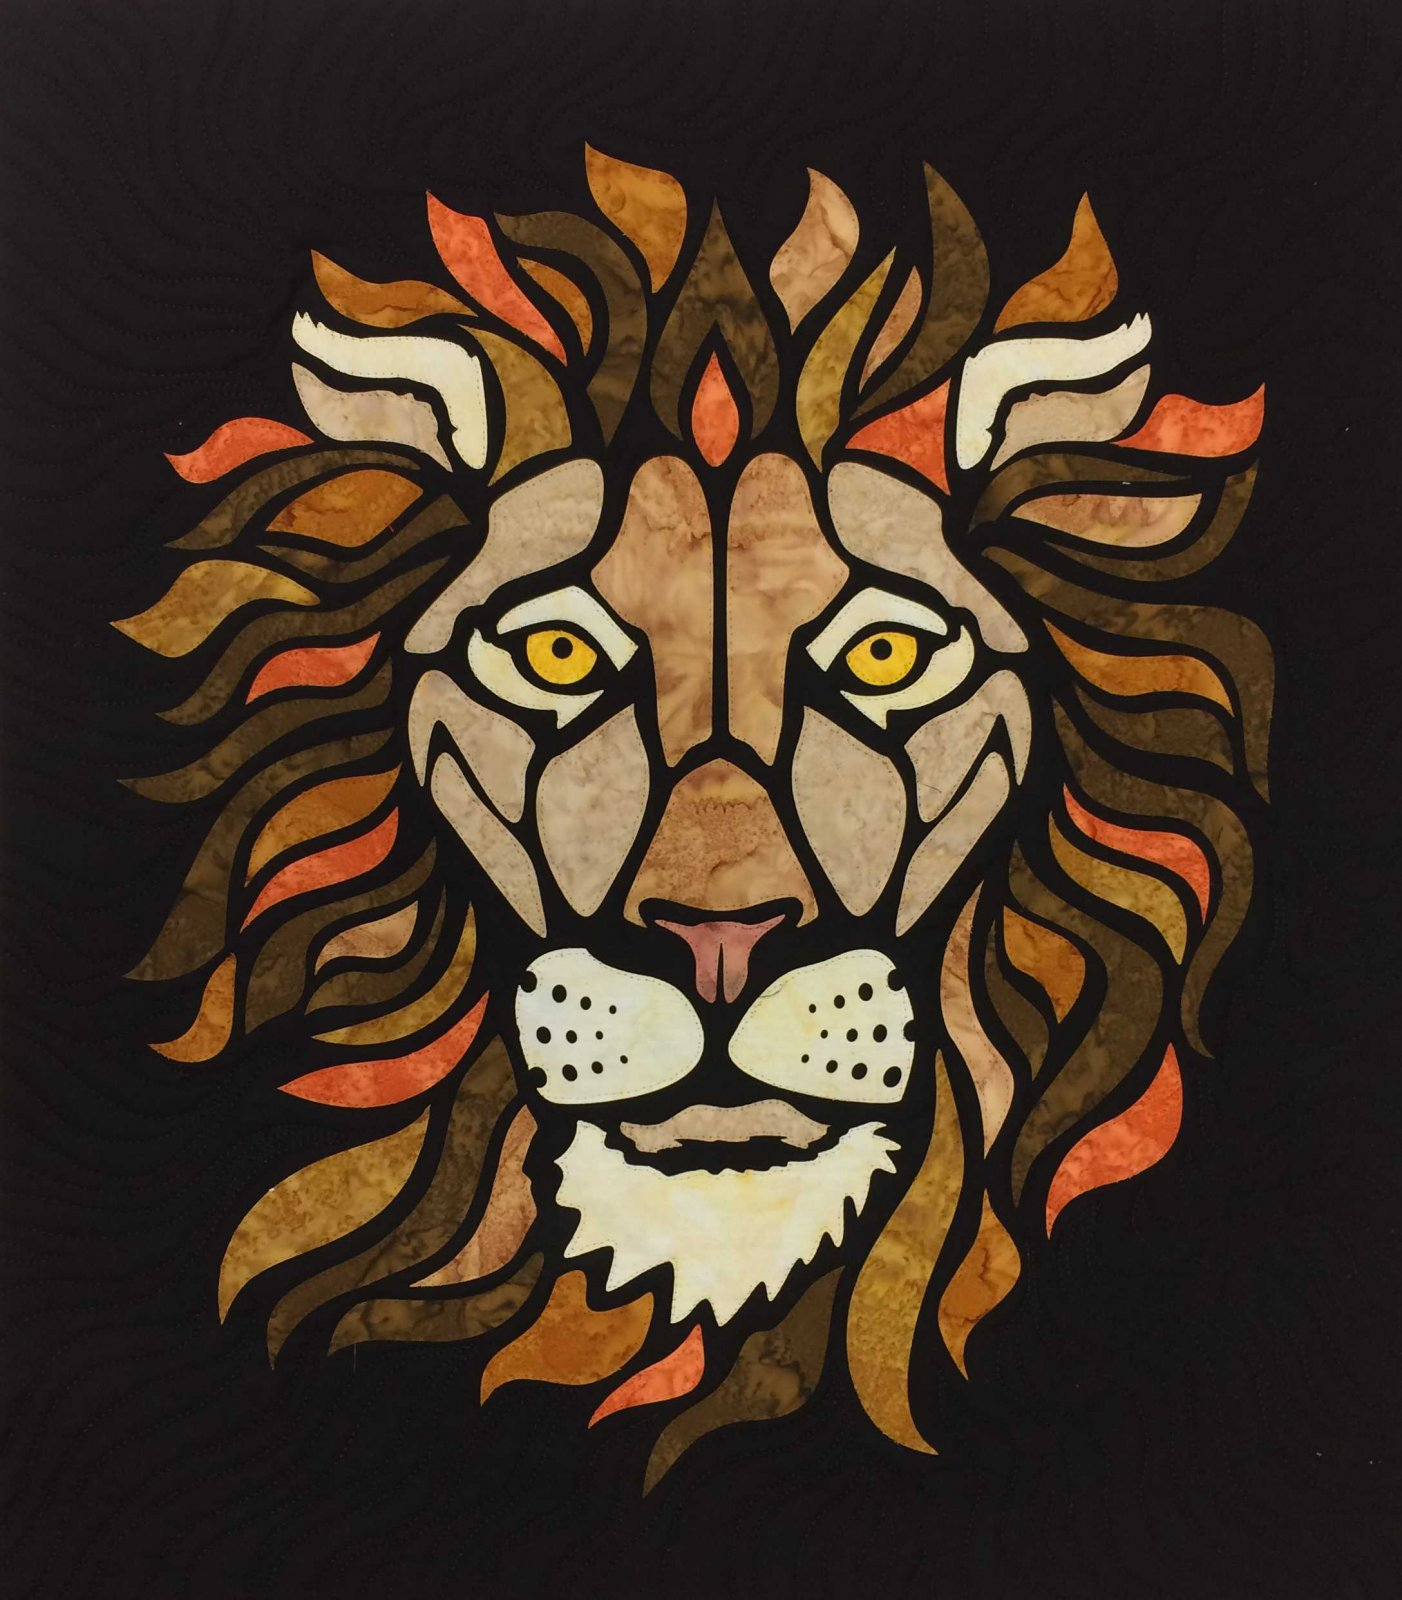 Lion 15 x 17 Sewfari Laser Cut Applique Kit by Westfield